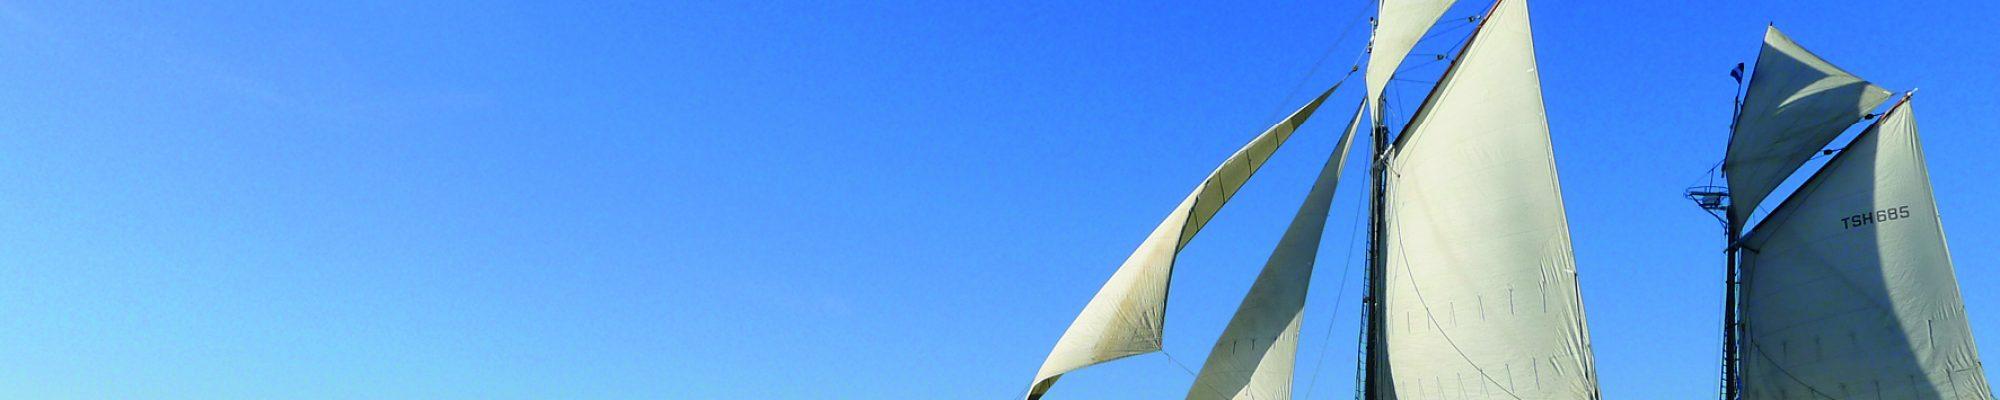 sailing vessel Tecla